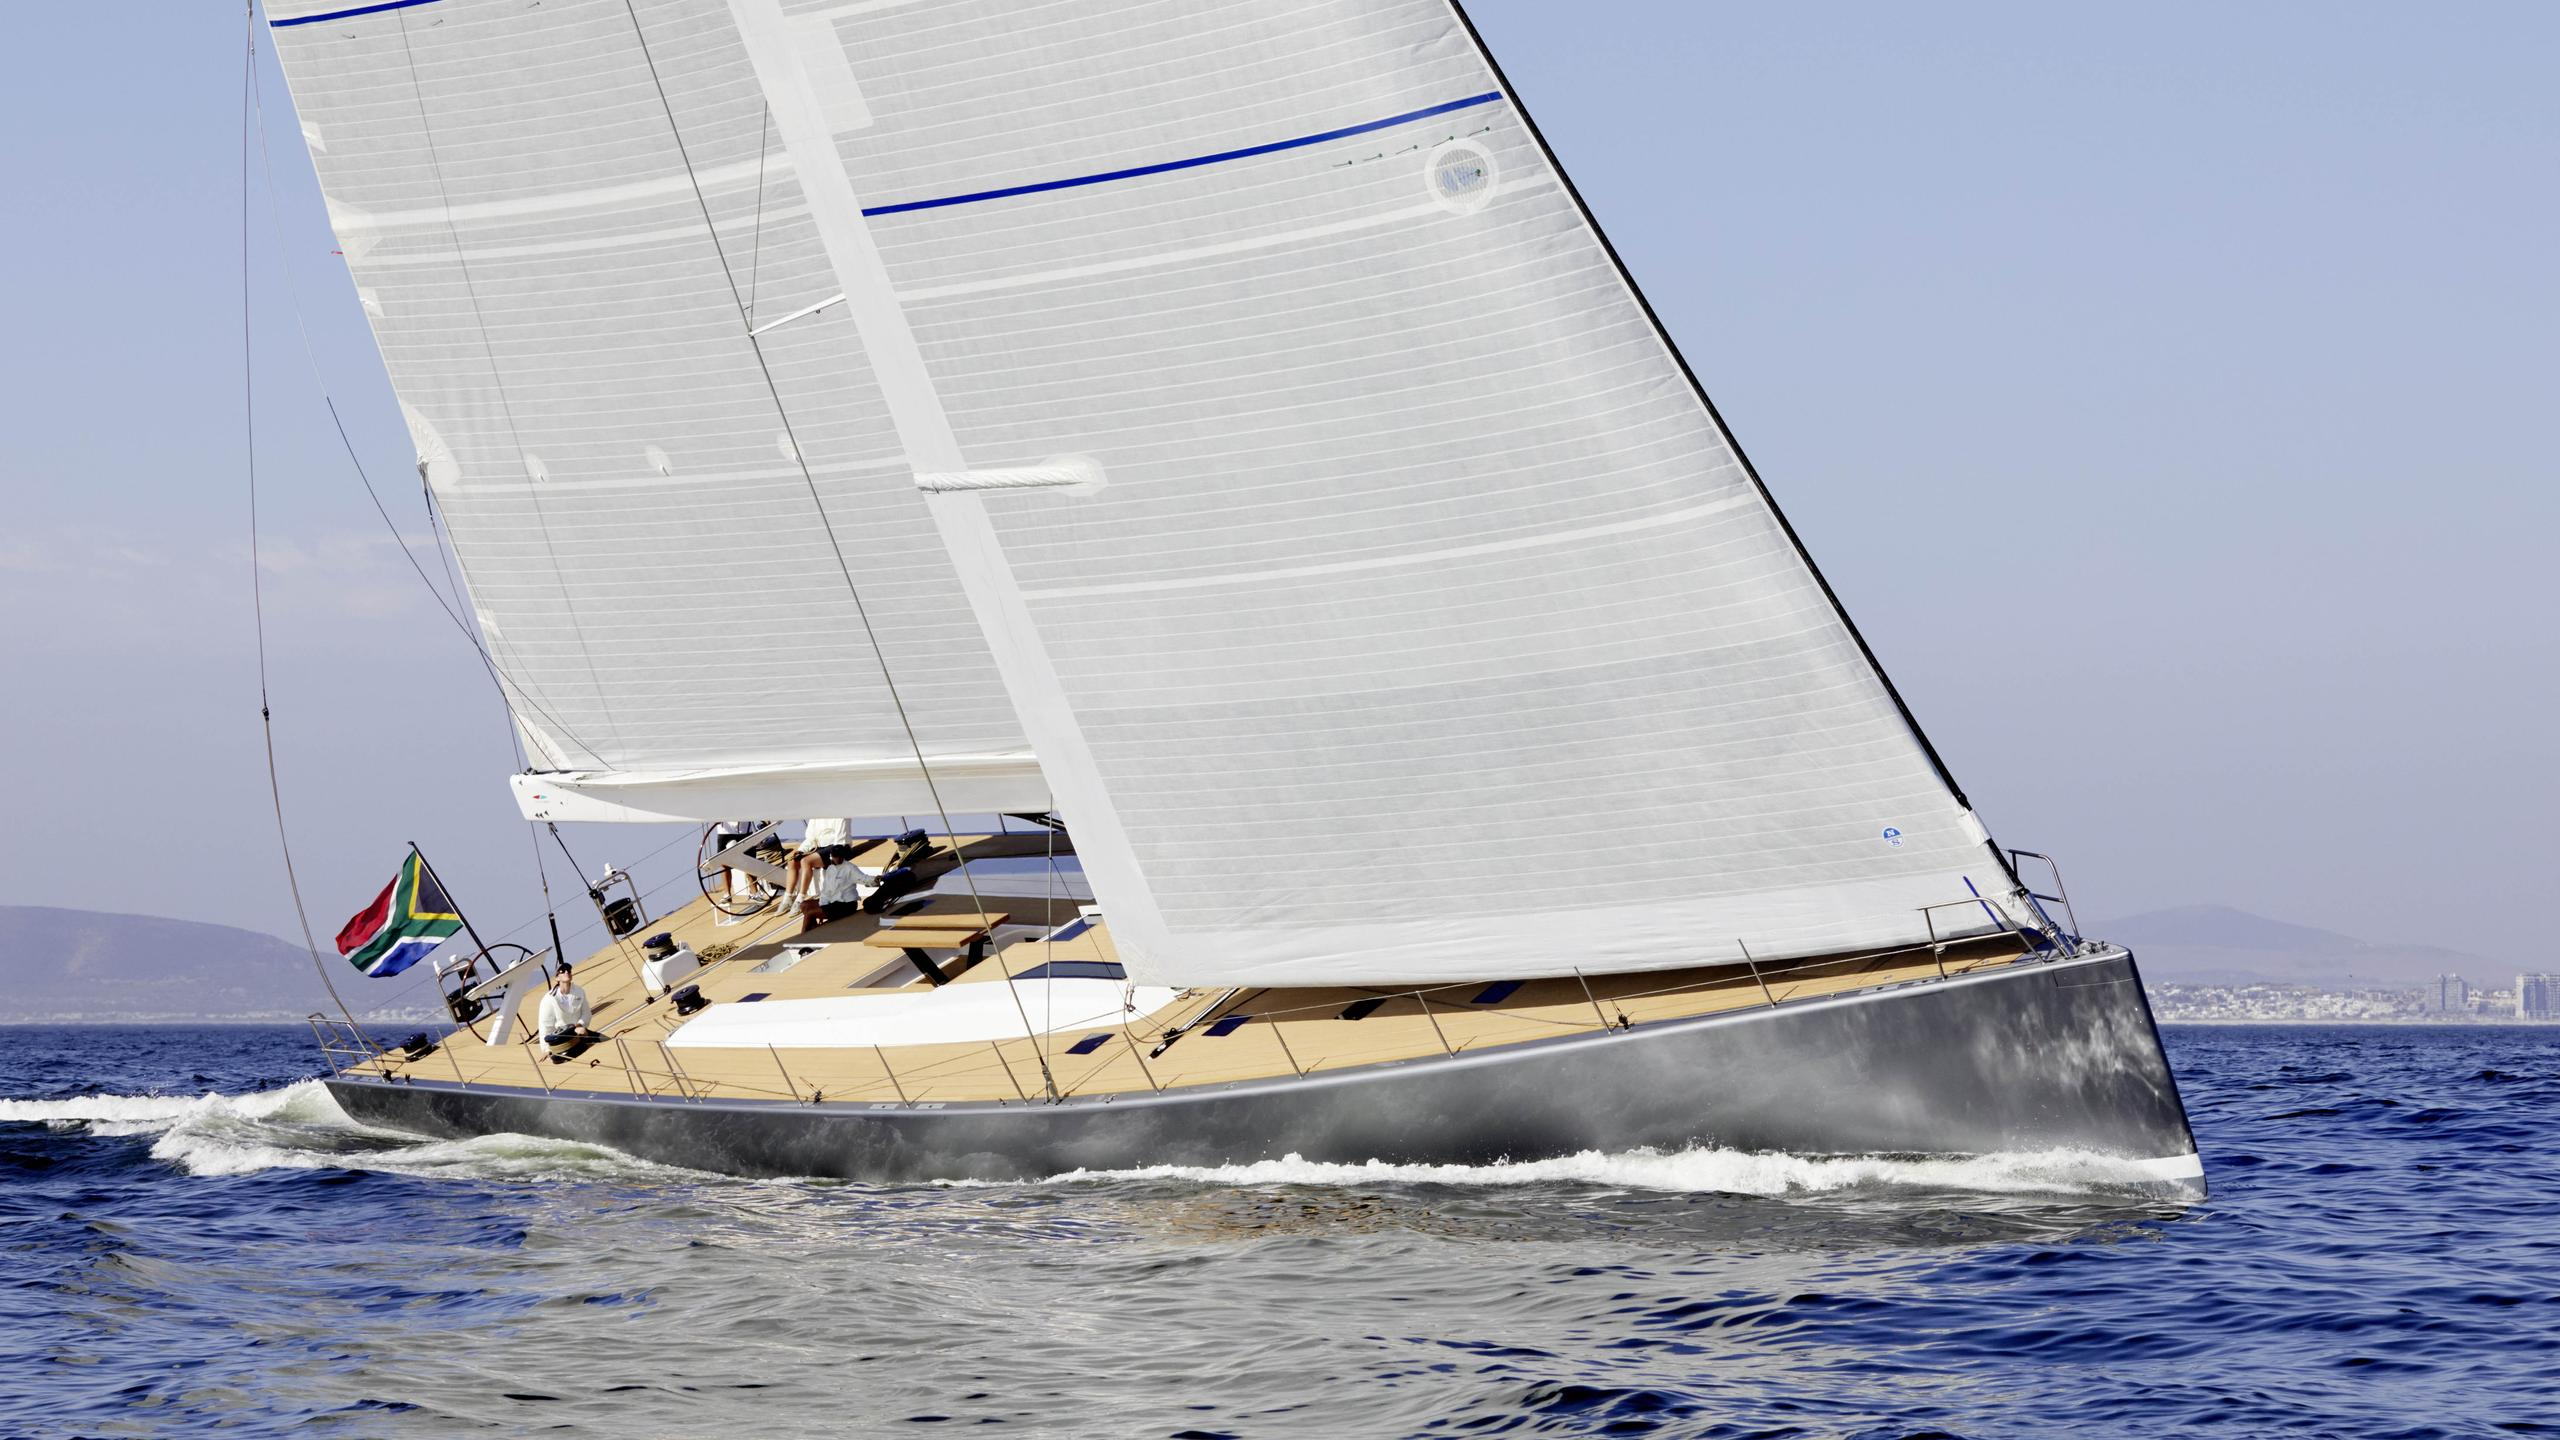 allsmoke sailing yacht southern wind shipyard swrp90 2017 27m half profile